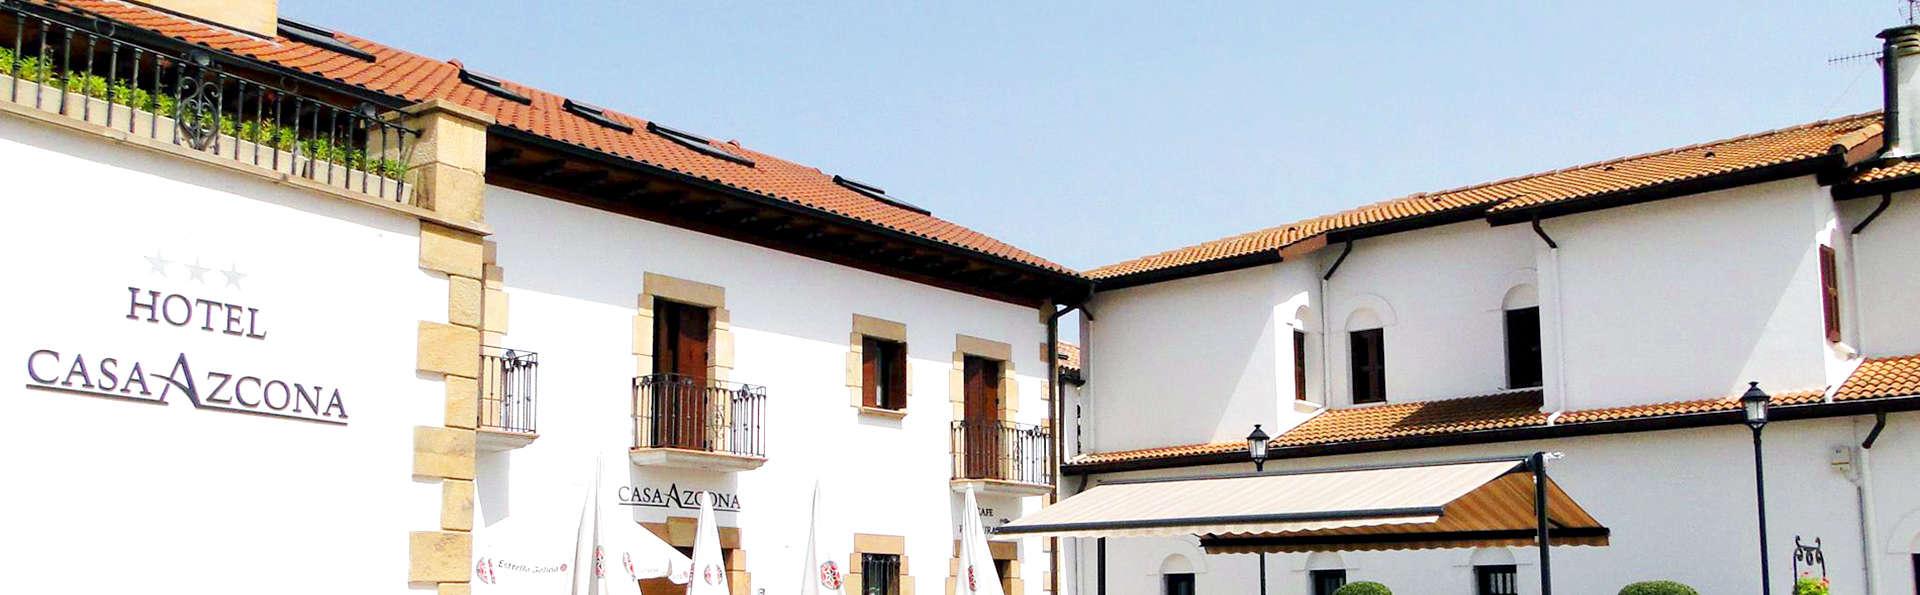 Hotel Casa Azcona - Edit_Front.jpg